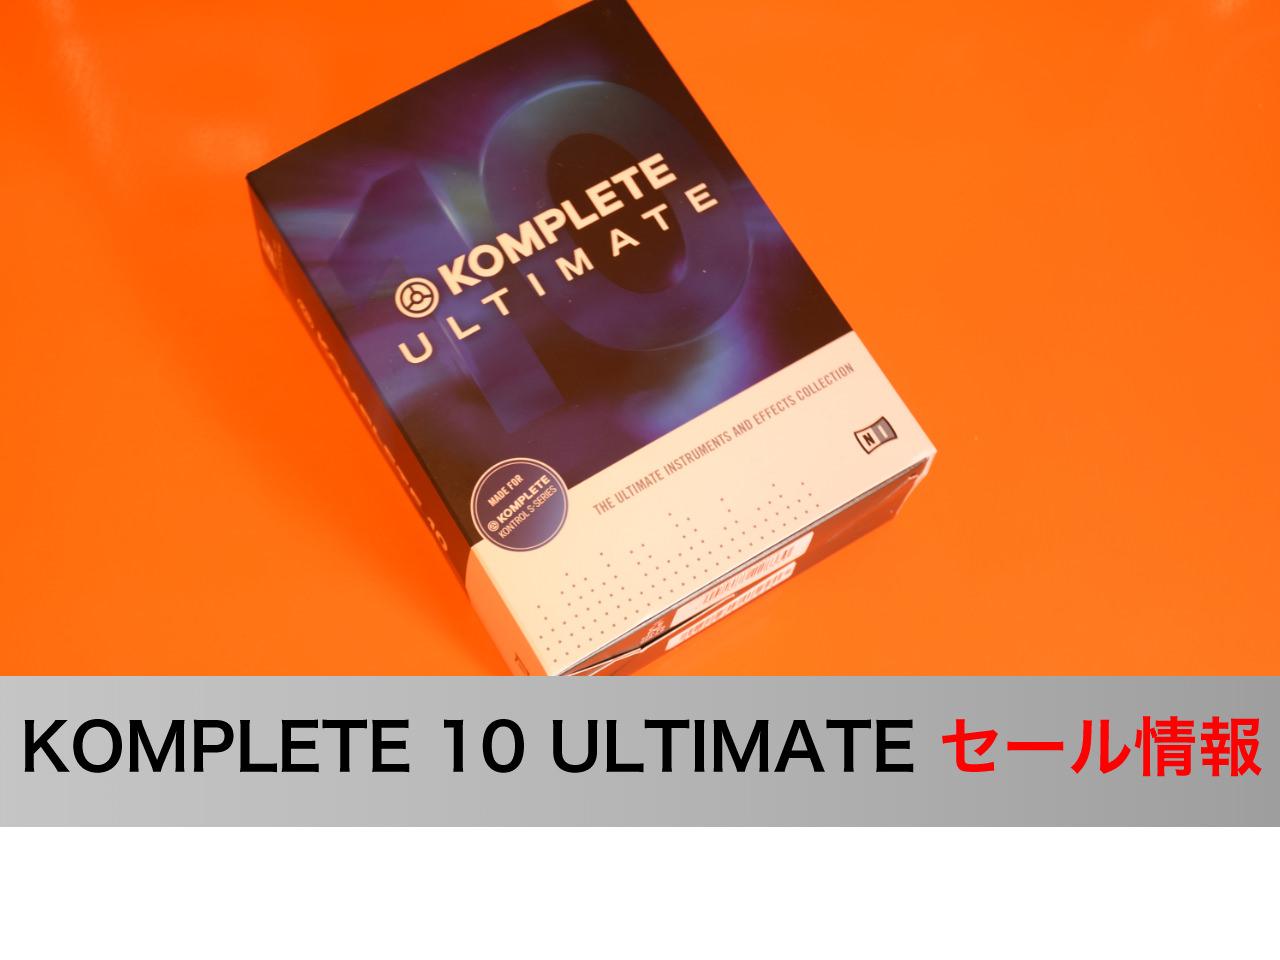 KOMPLETE 10 ULTIMATEセール